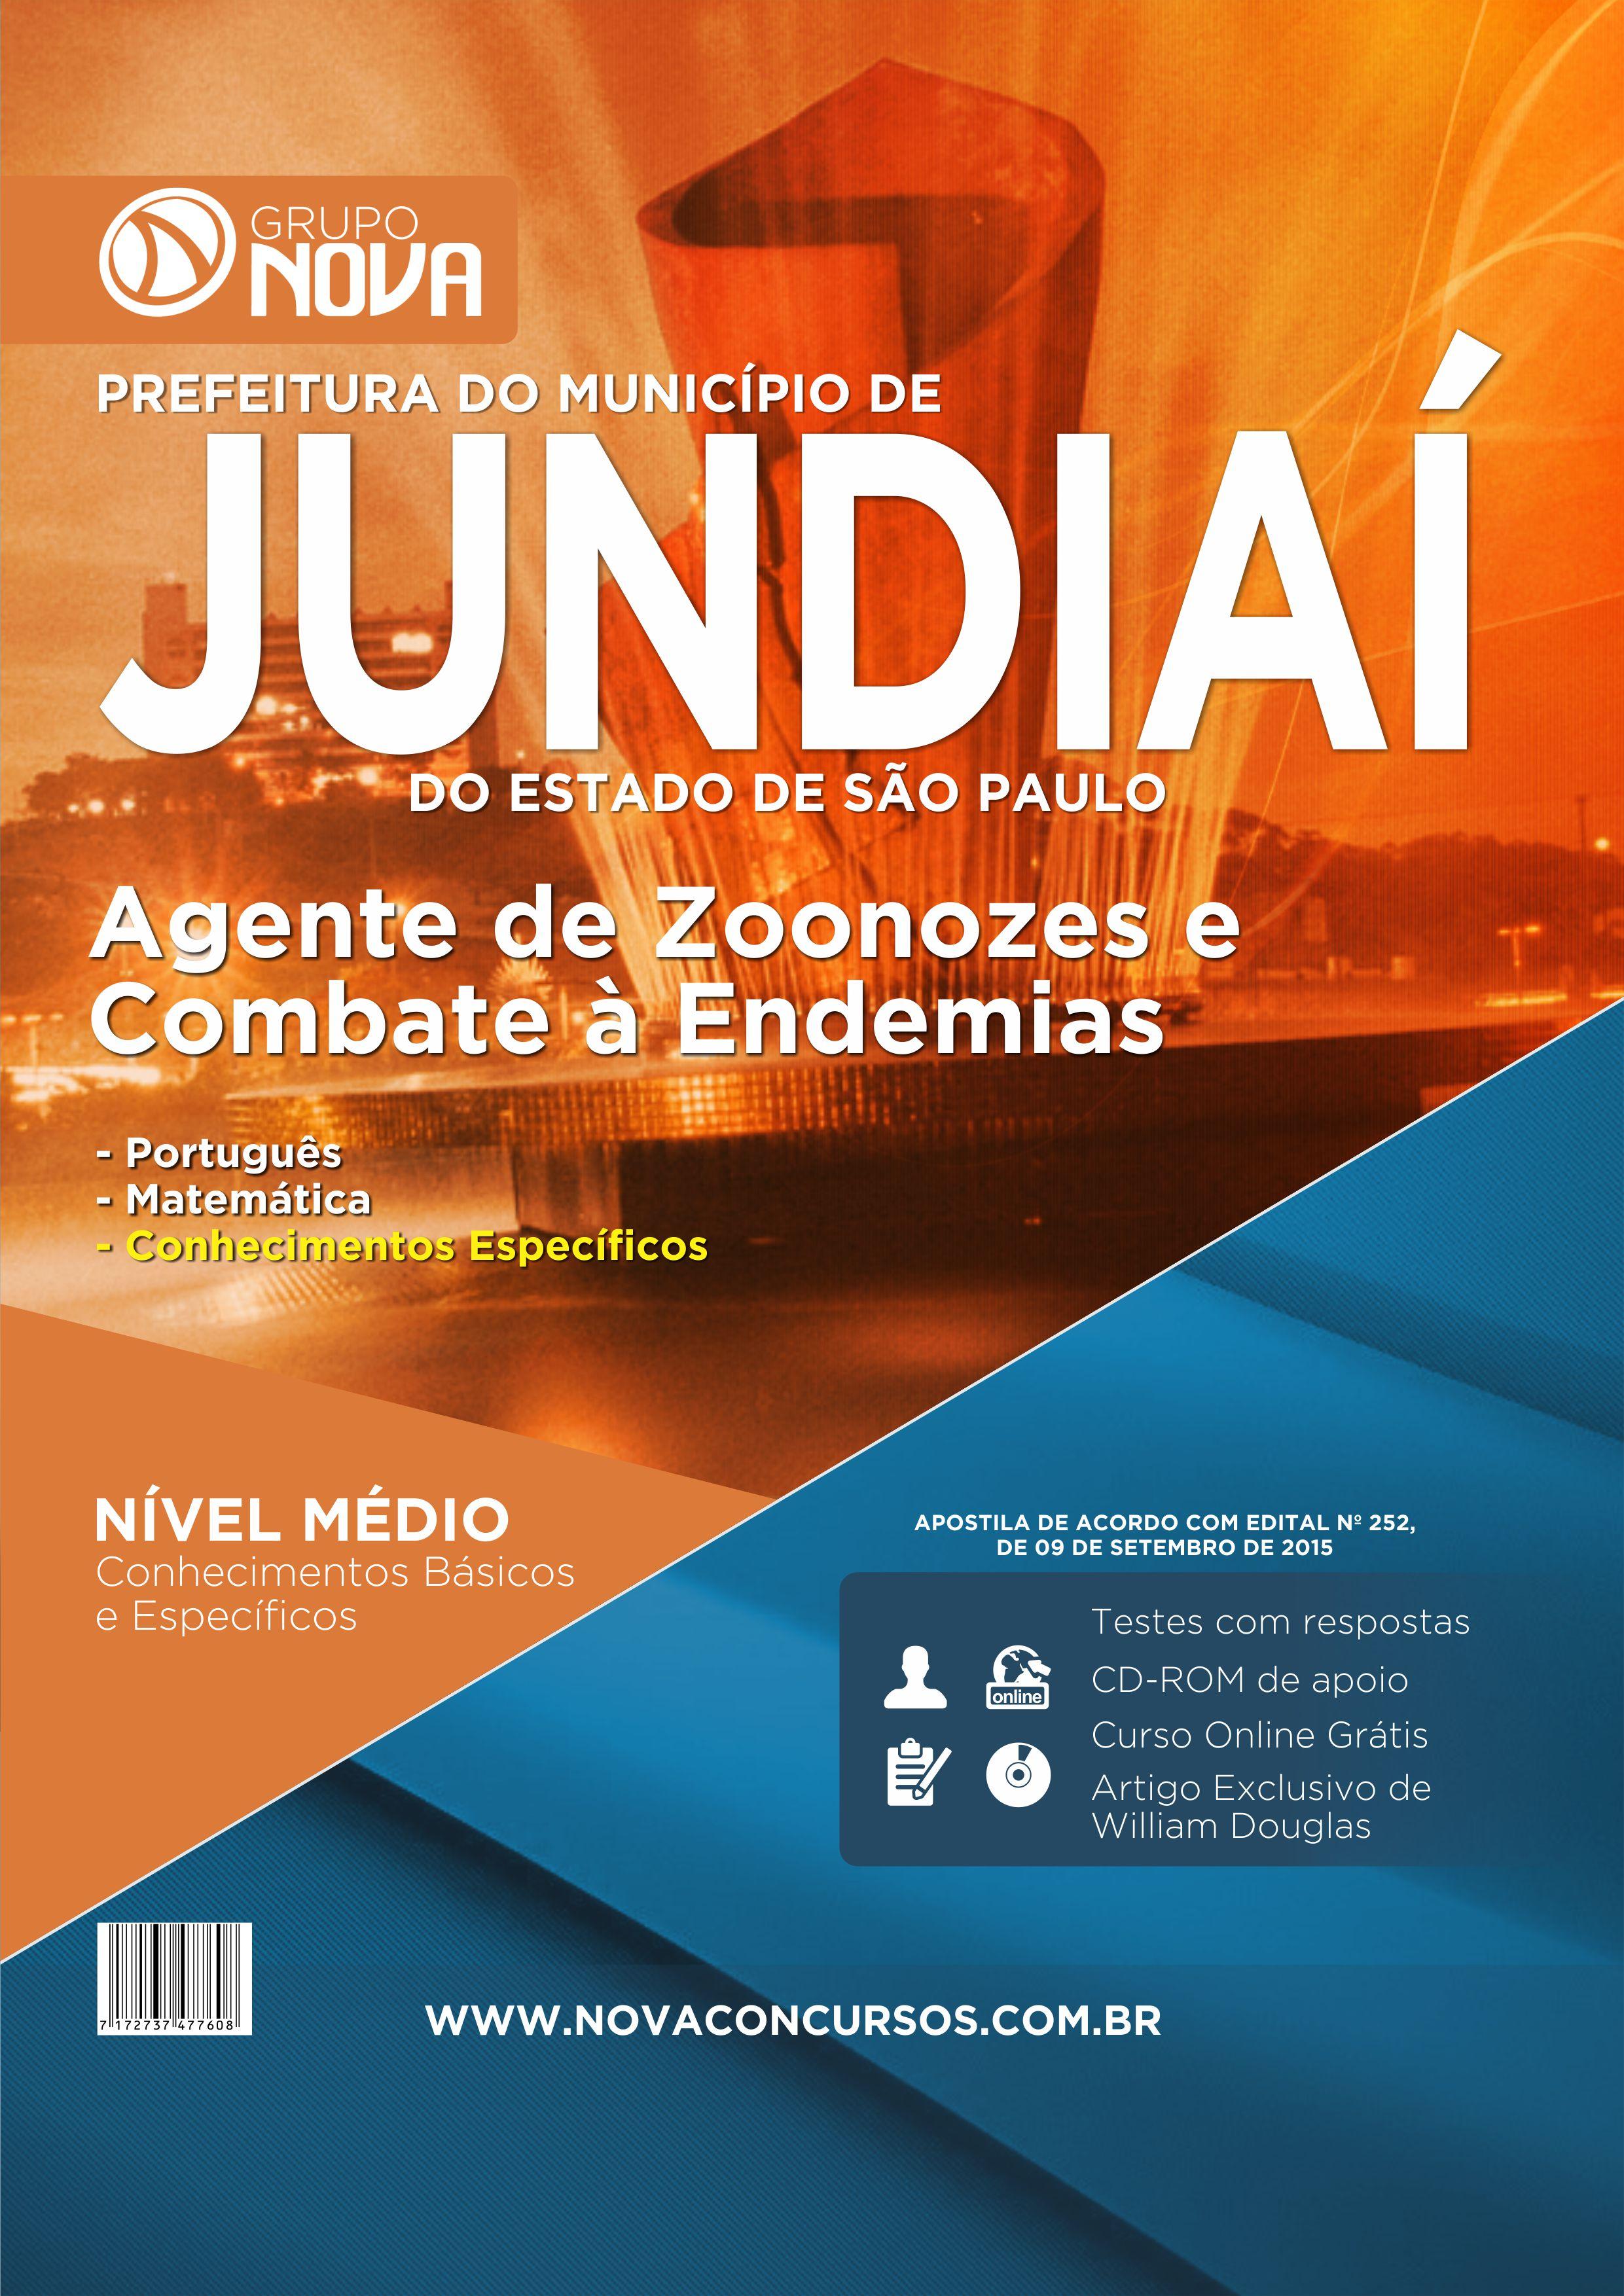 Apostila Jundiaí 2015 - Agente de Zoonoses e Combate à s Endemias ( Impresso )